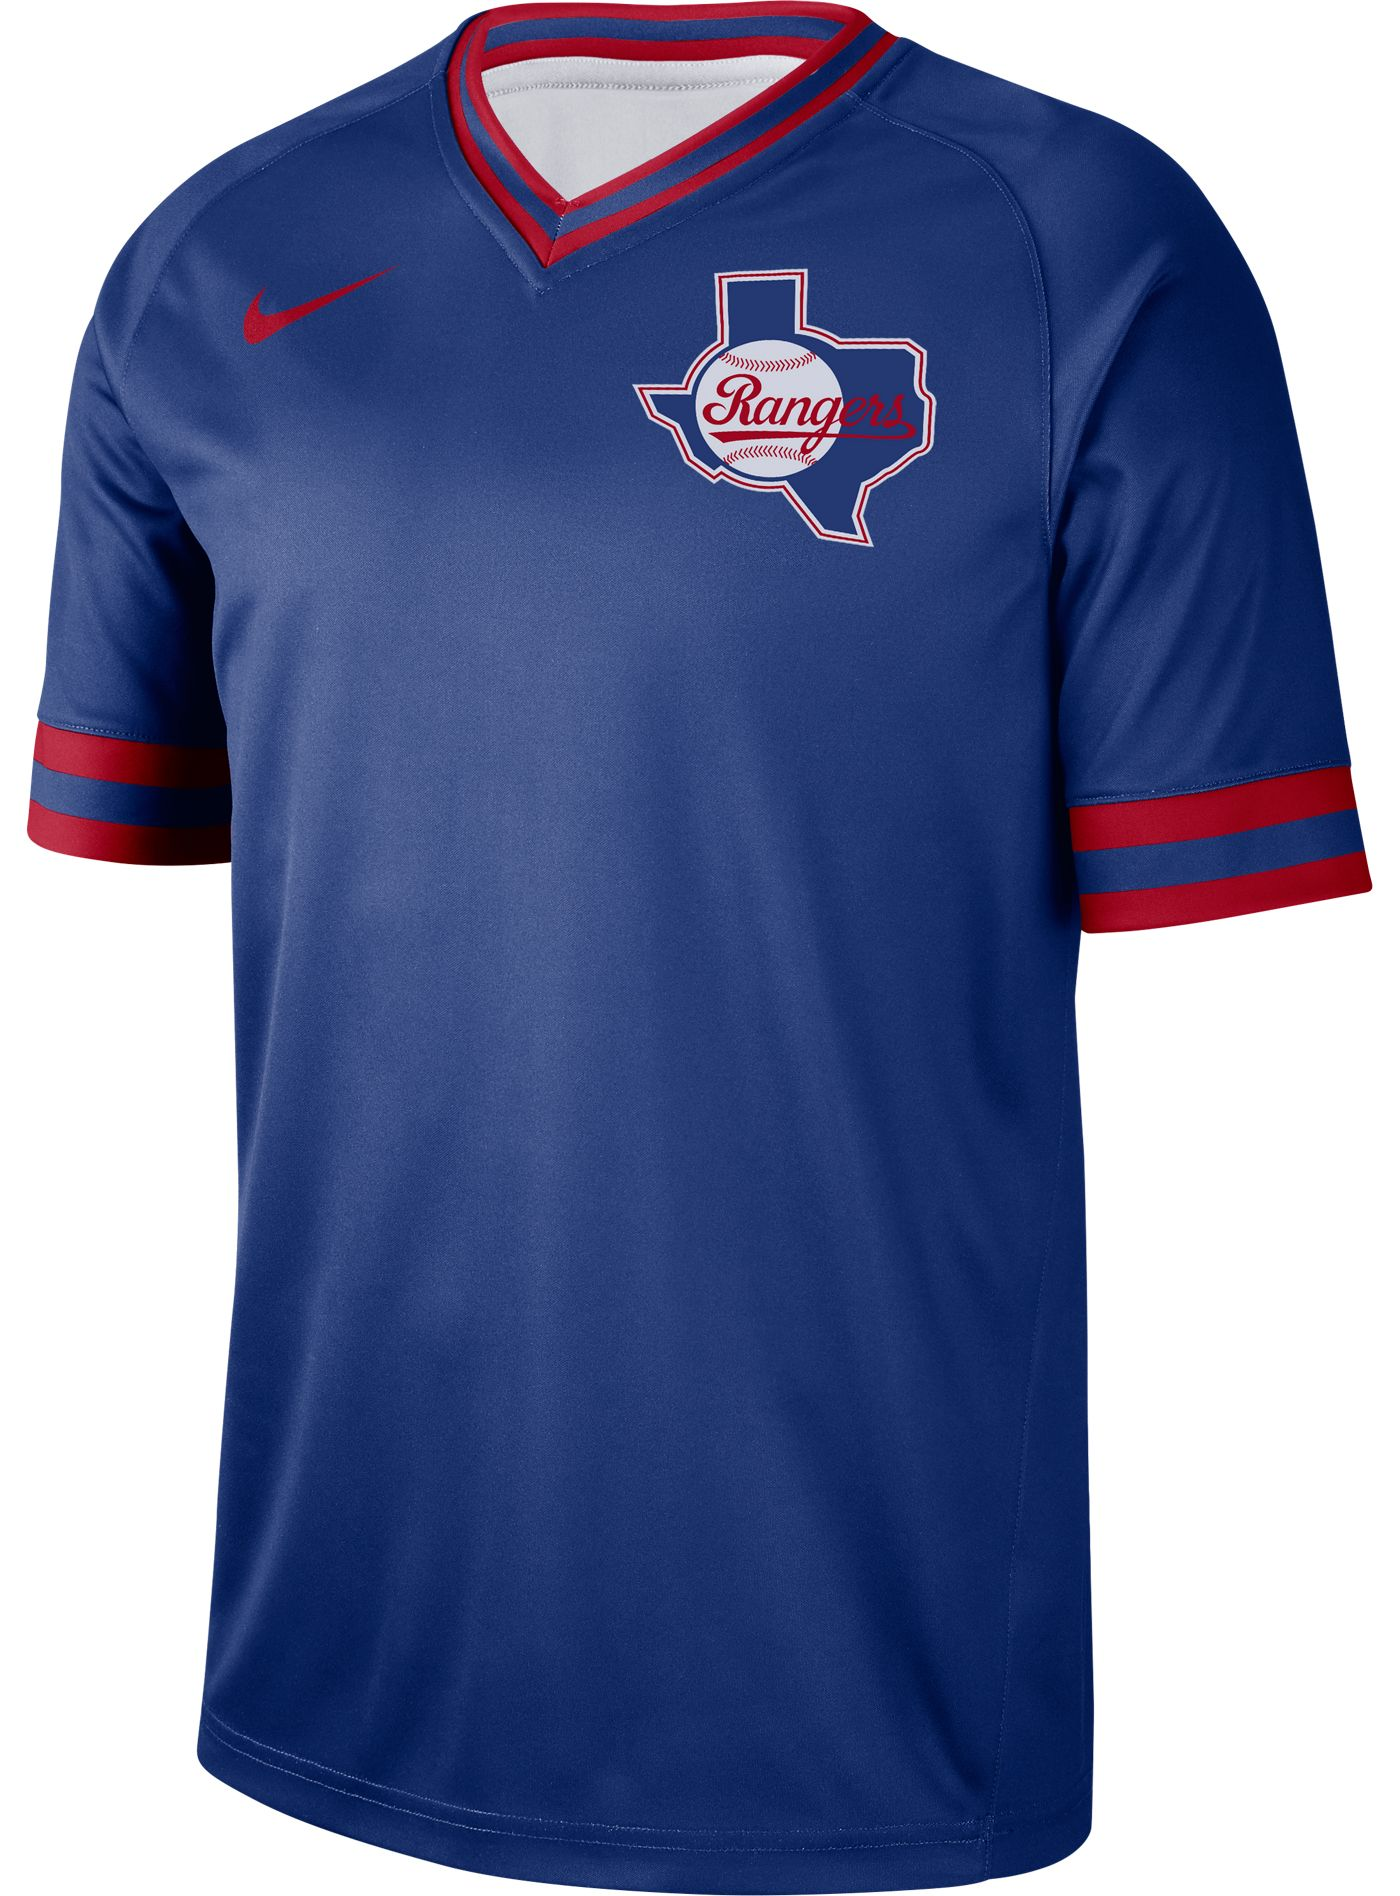 Nike Men's Texas Rangers Cooperstown V-Neck Pullover Jersey